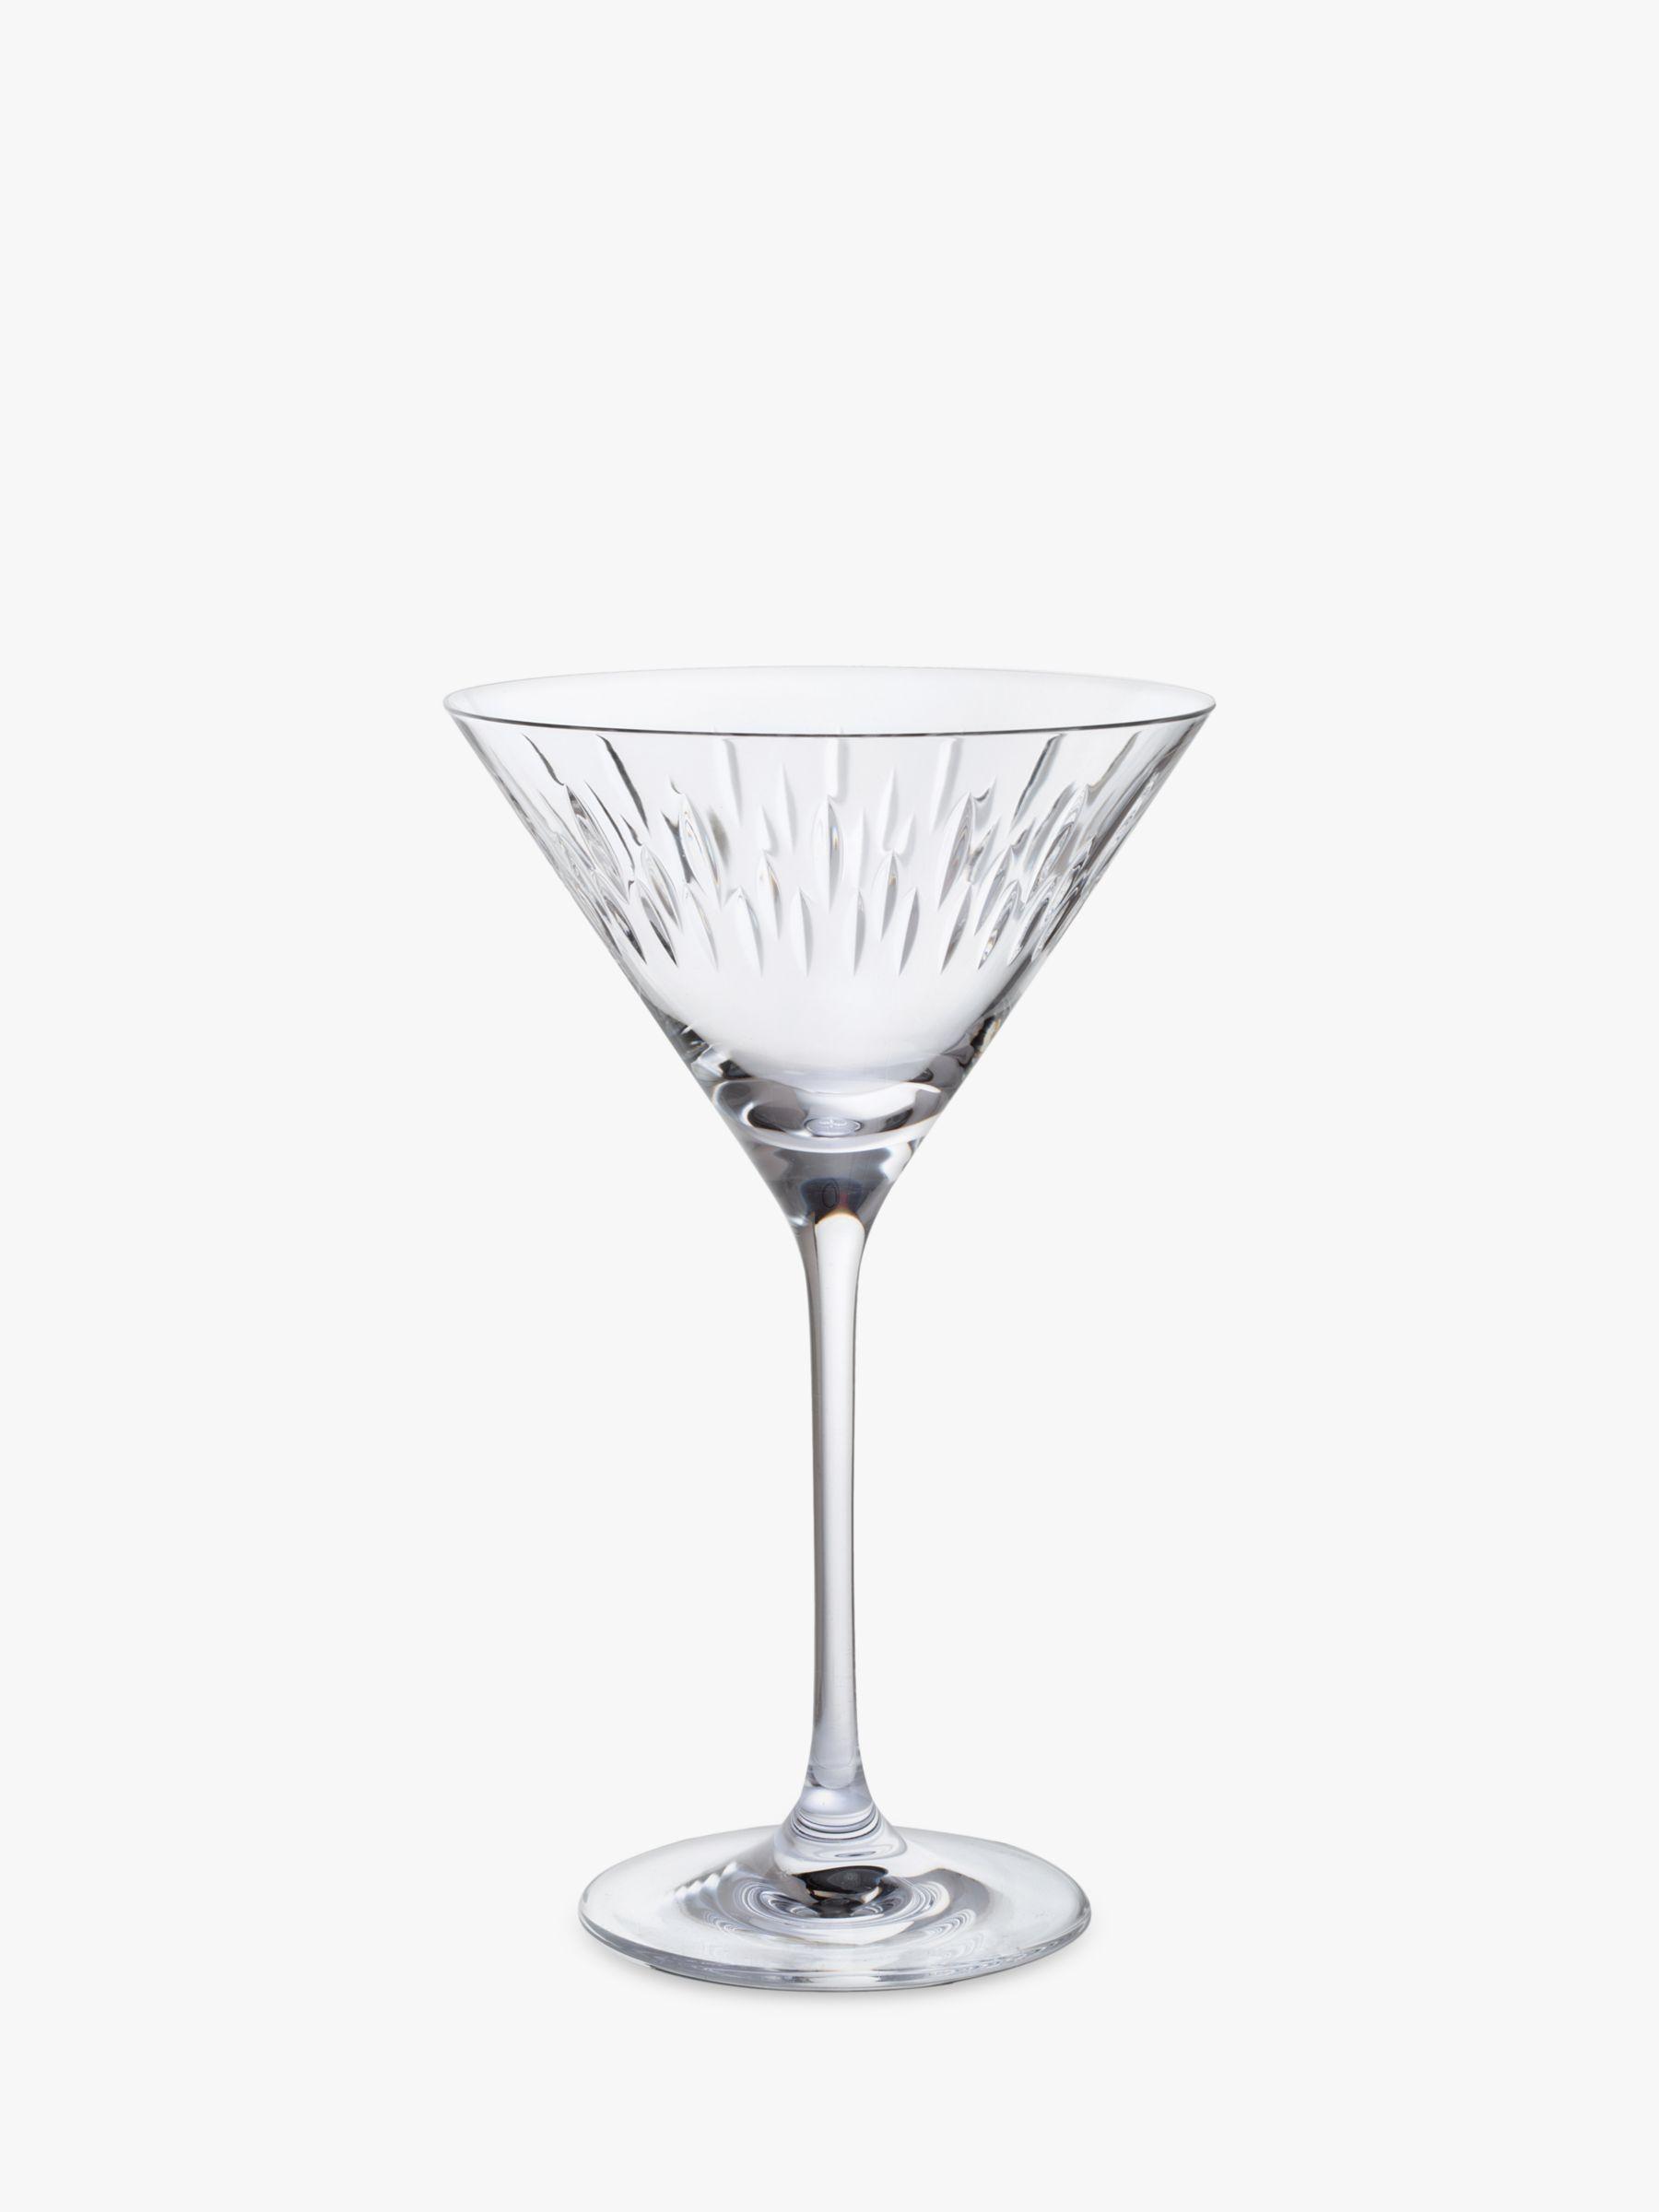 Dartington Crystal Dartington Crystal Limelight Cut Glass Martini Glasses, Set of 2, 210ml, Clear